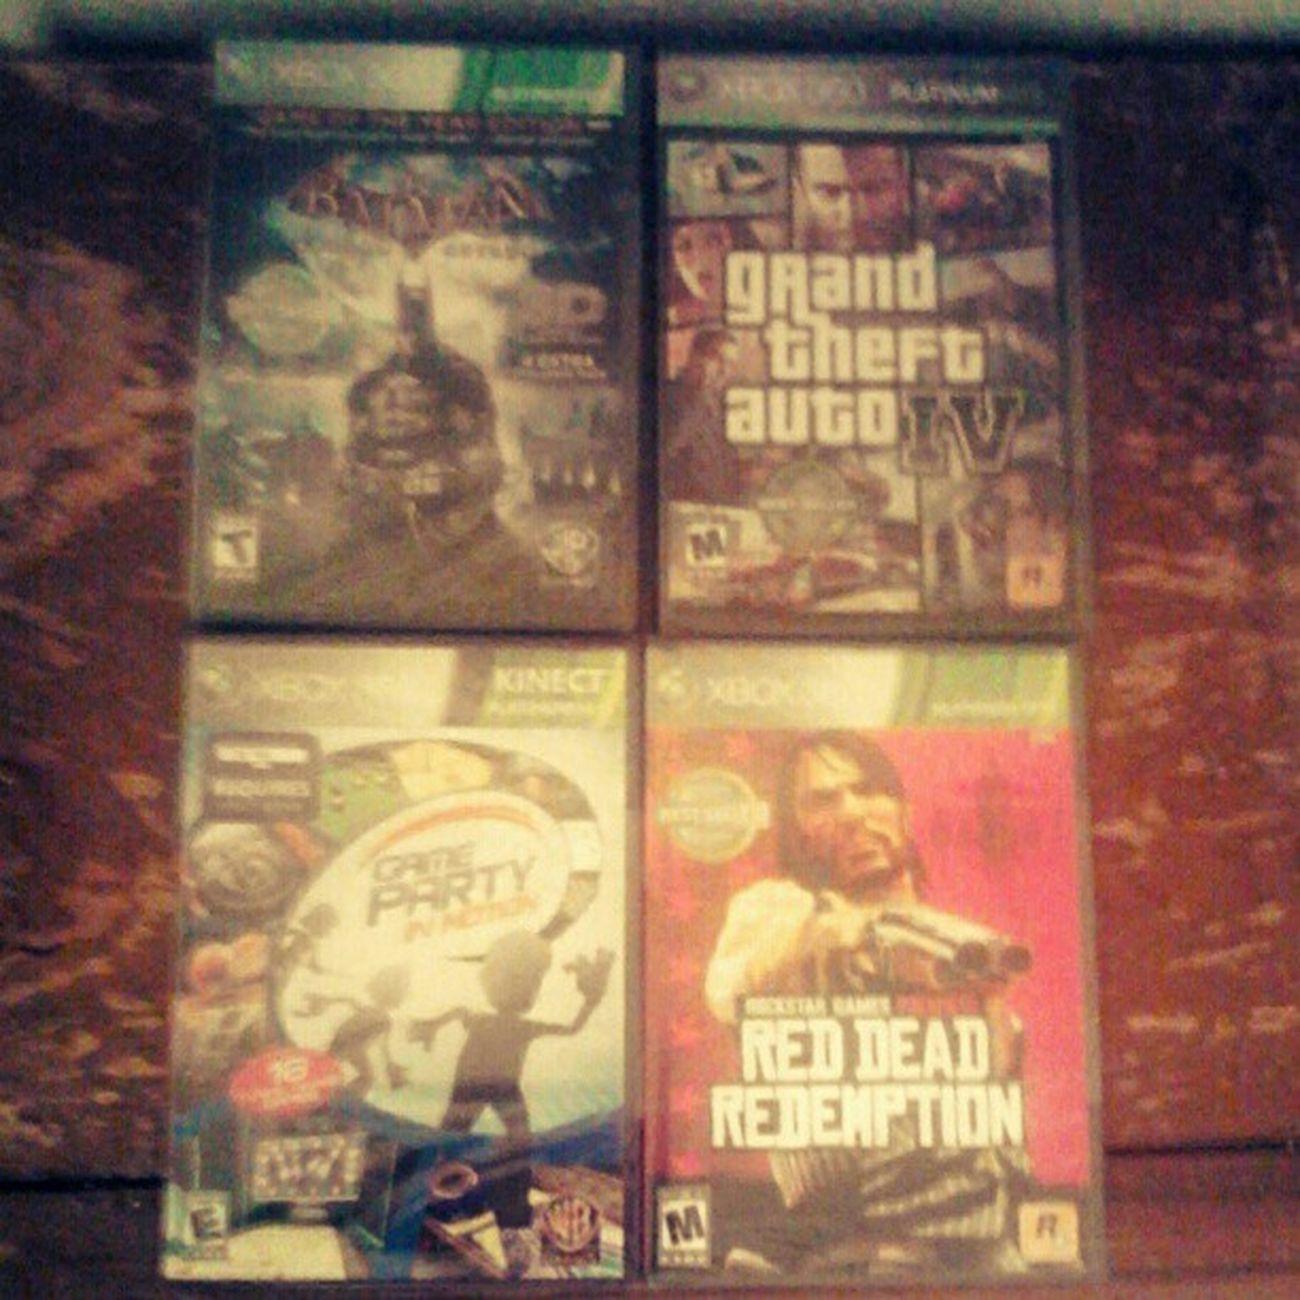 New games! #xbox #xbox360 #gamer #videogames #new Xbox Batman New Gamer Videogames Xbox360 Reddeadredemption GrandTheftAuto GrandTheftAutoIV Snapplay Hardcore_gamer_girls